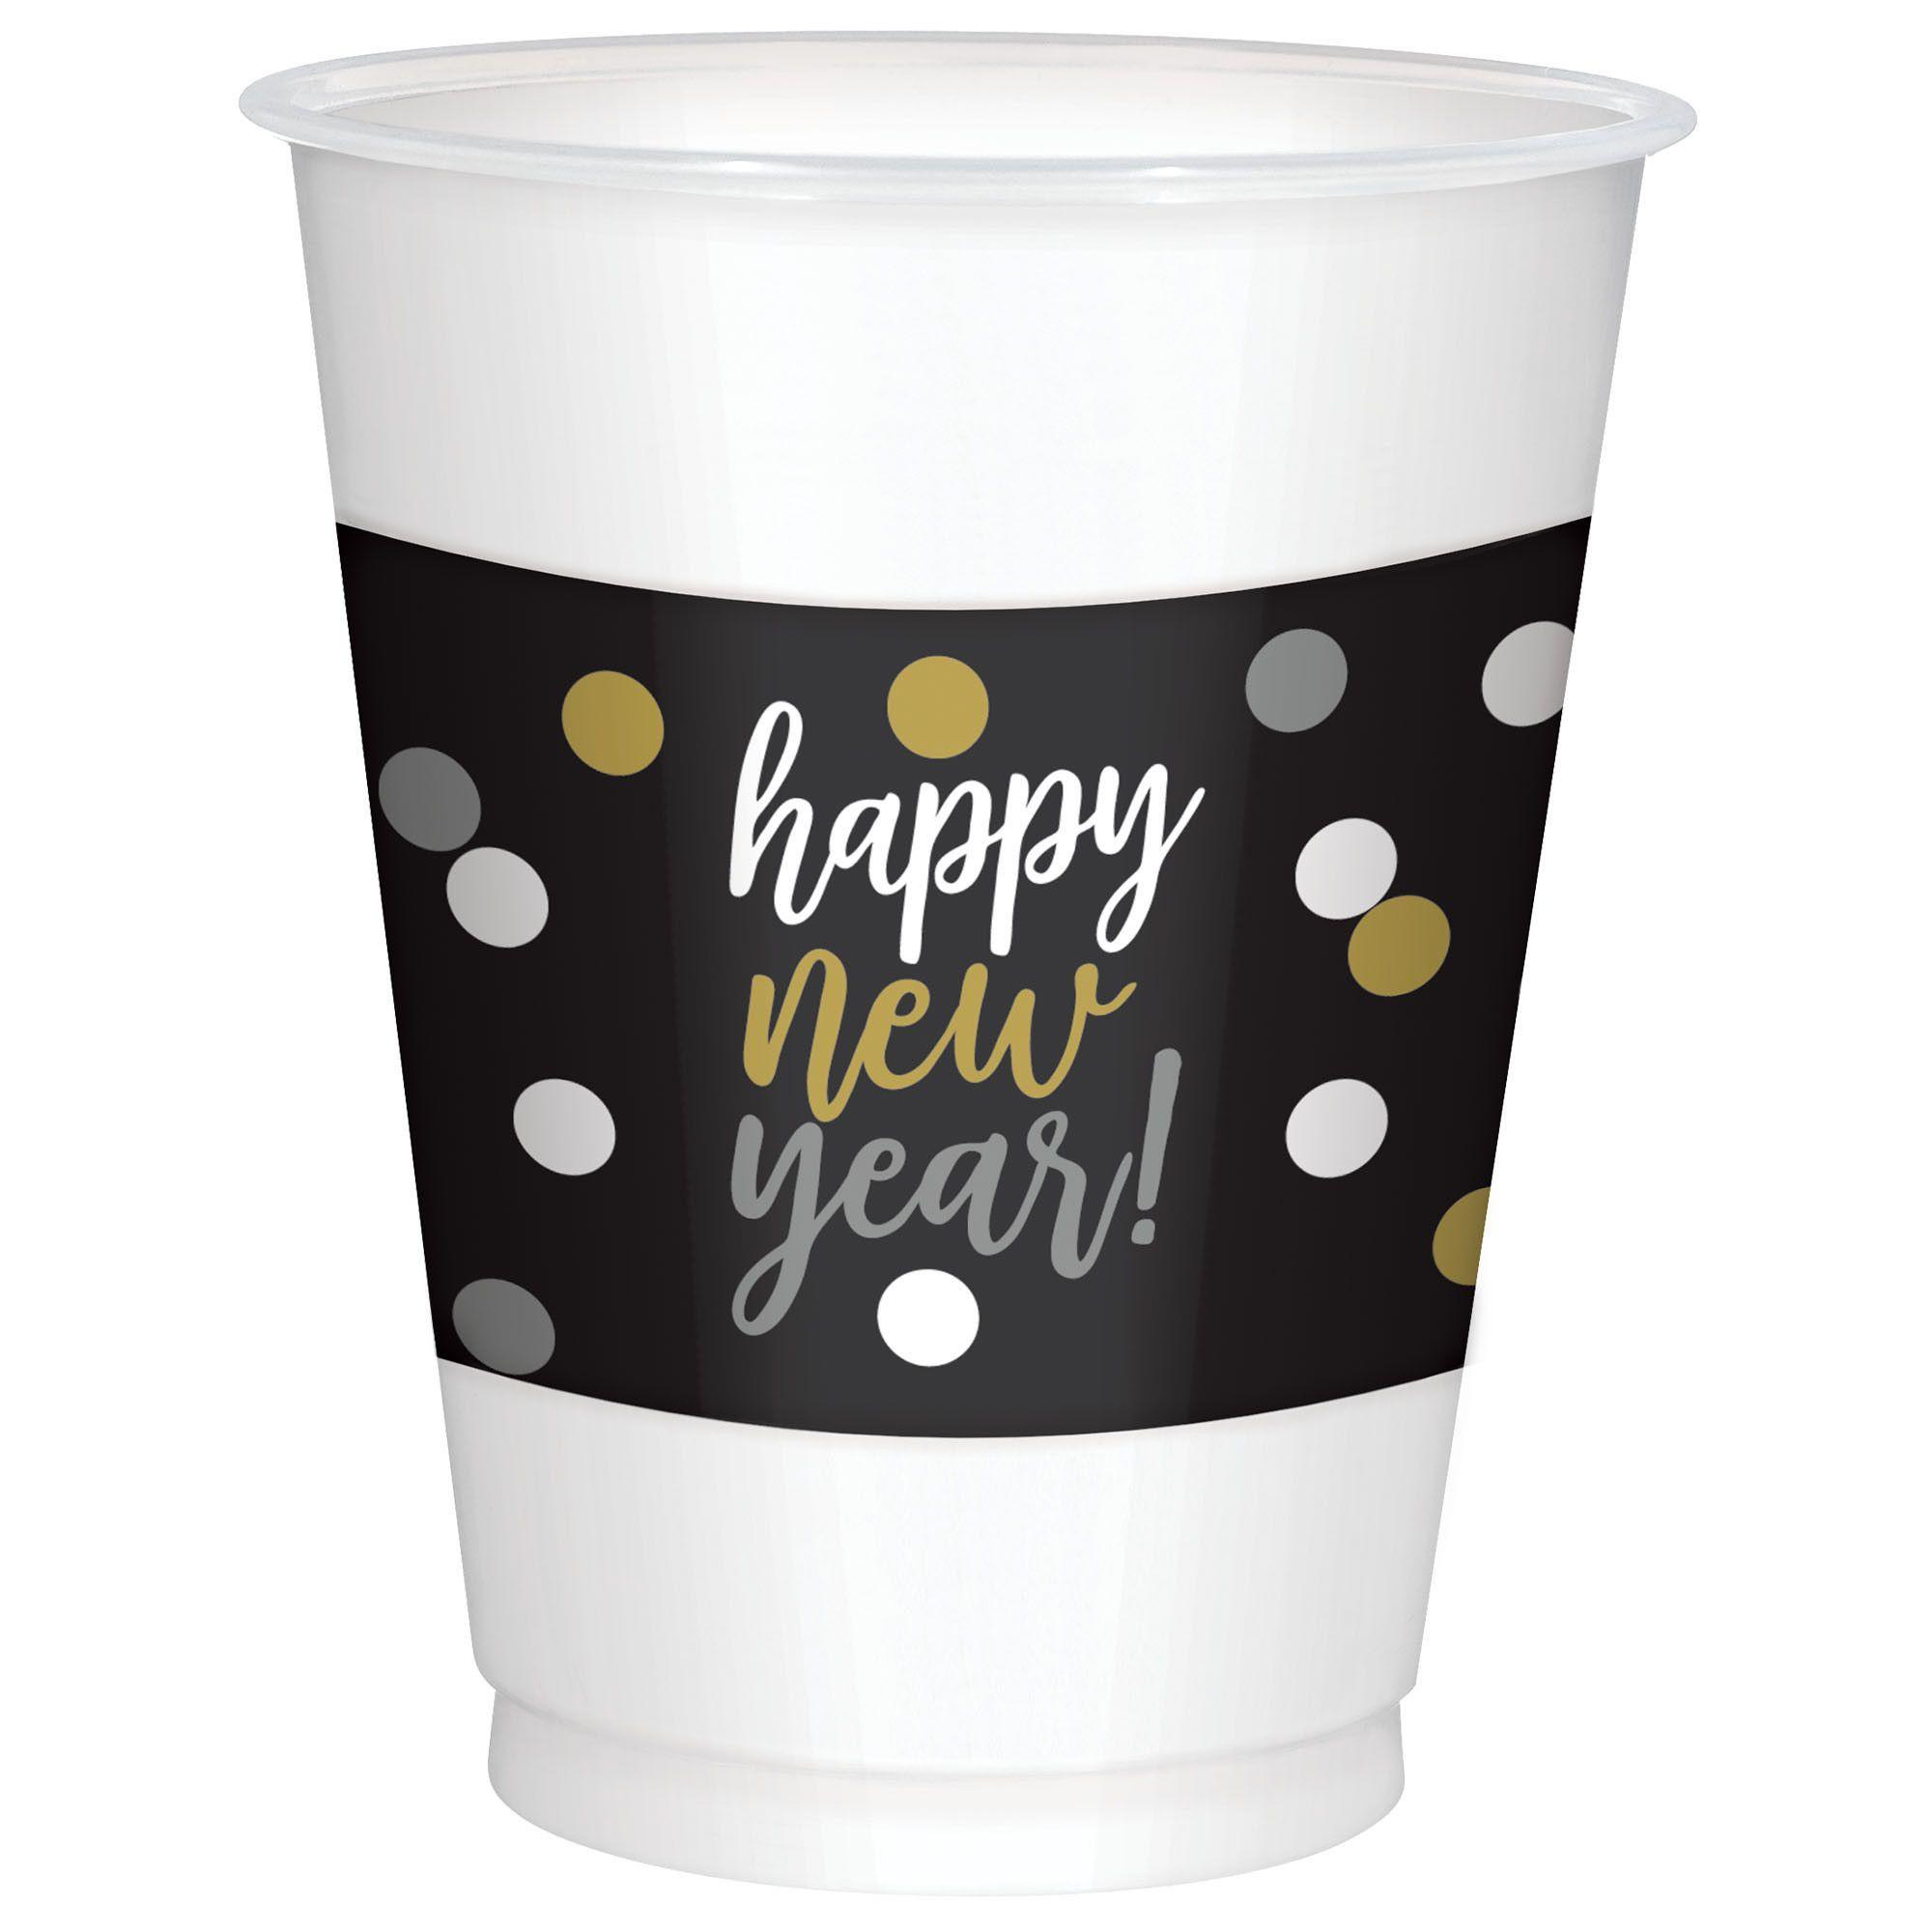 NYs Plastic Cups 16 oz